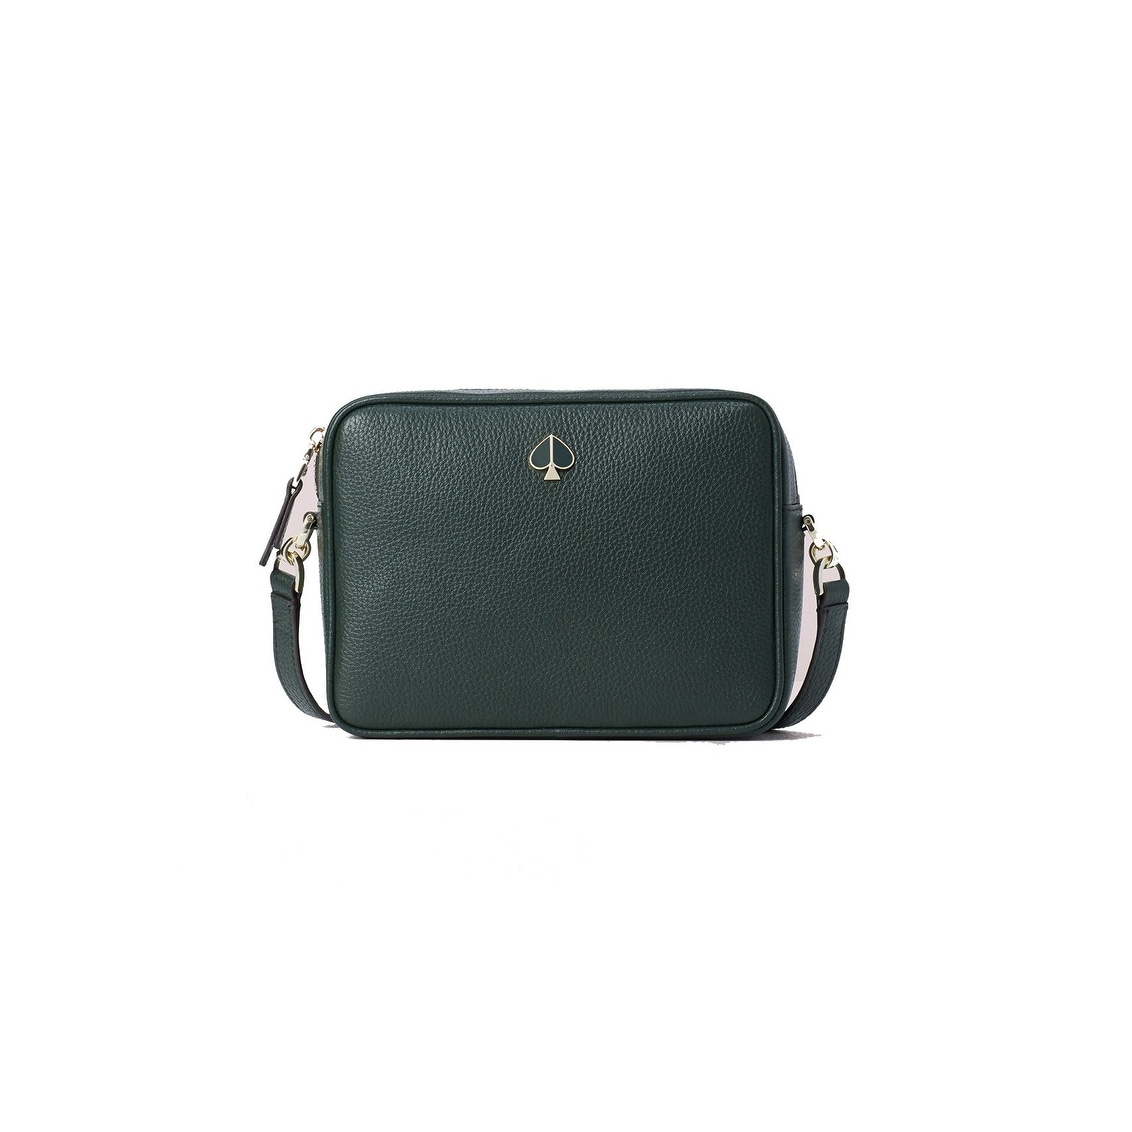 Shop Kate Spade Polly Medium Camera Bag Deep Evergreen Overstock 30539812